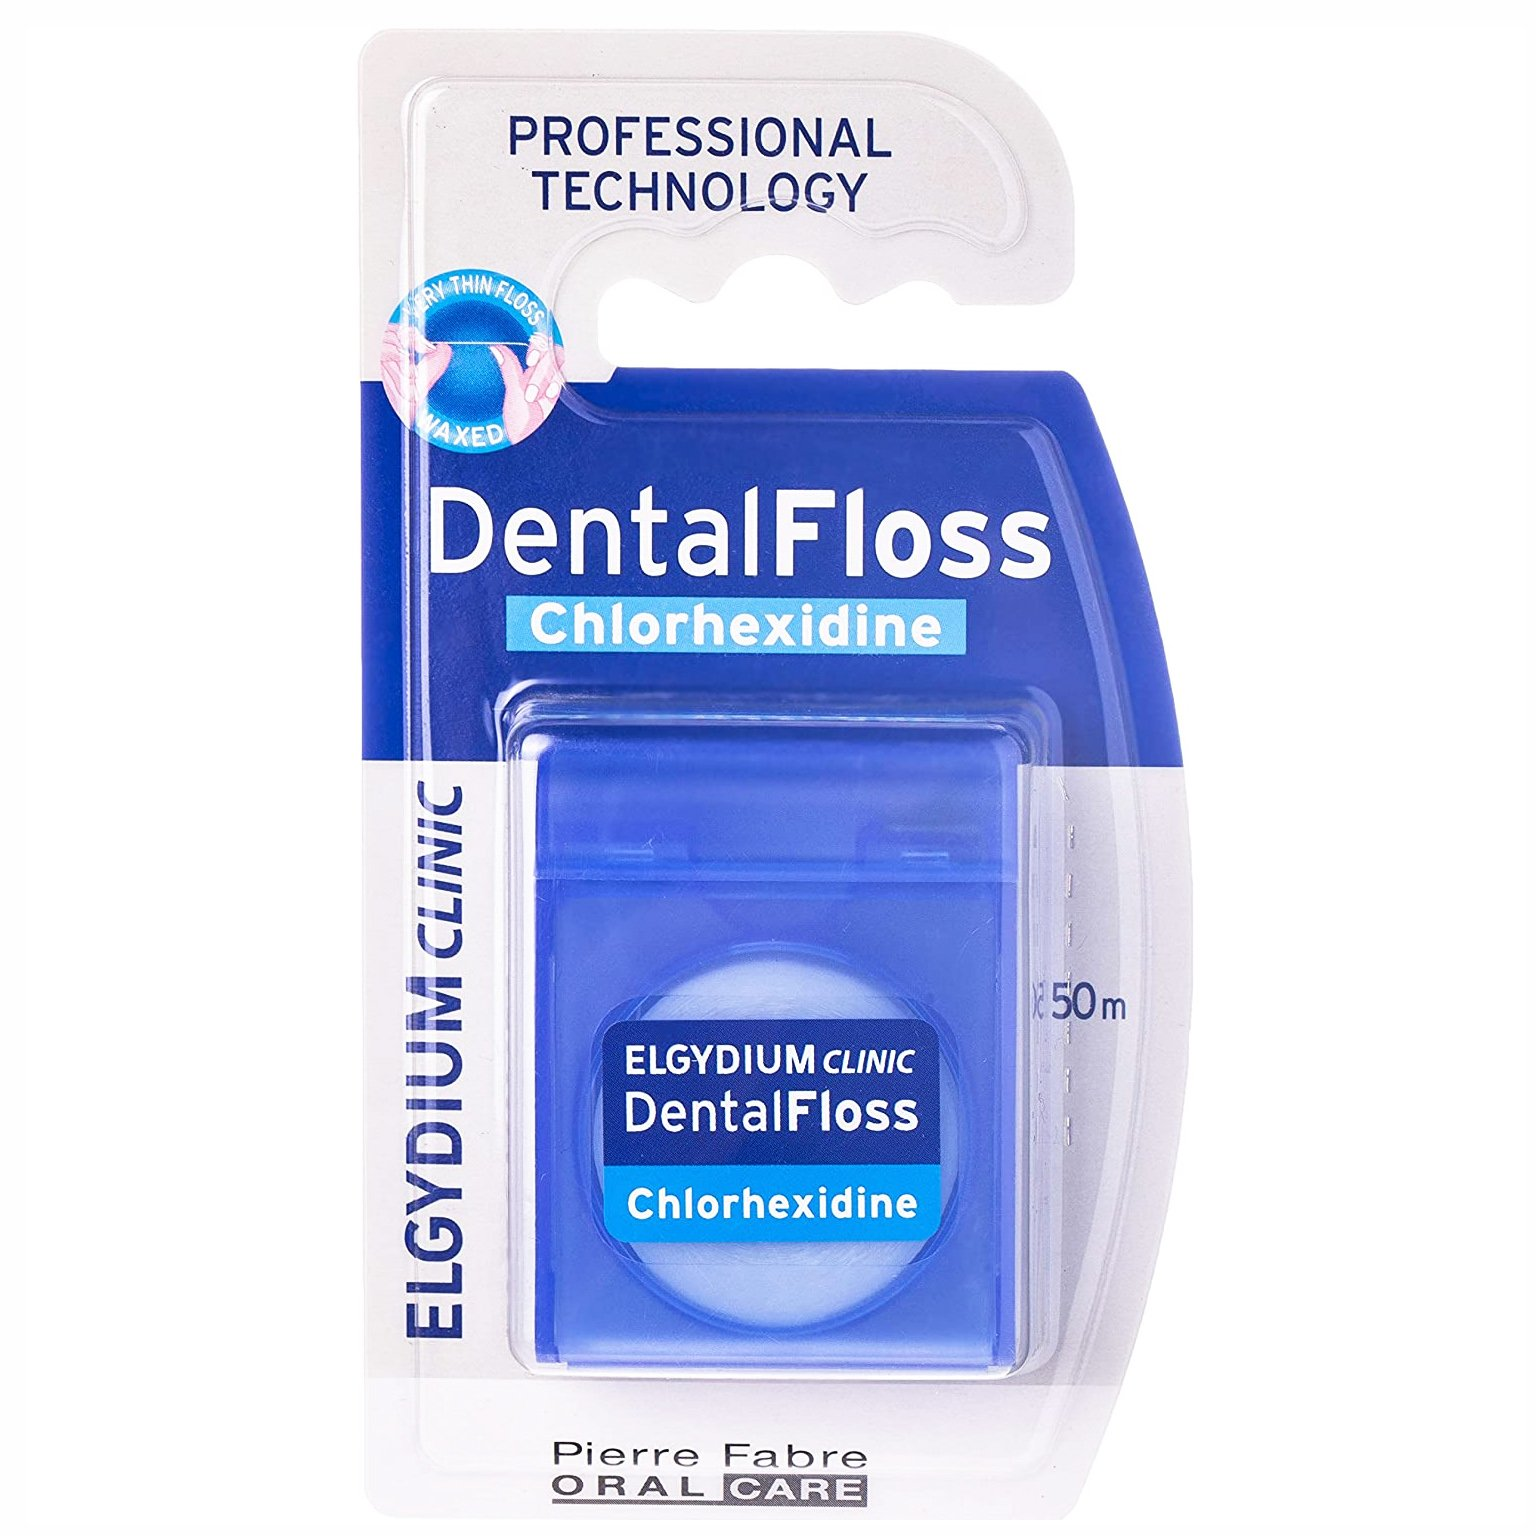 Elgydium Clinic Dental Floss Chlorhexidine Οδοντικό Νήμα με Χλωρεξιδίνη για Μείωση του Σχηματισμού της Οδοντικής Πλάκας 50m